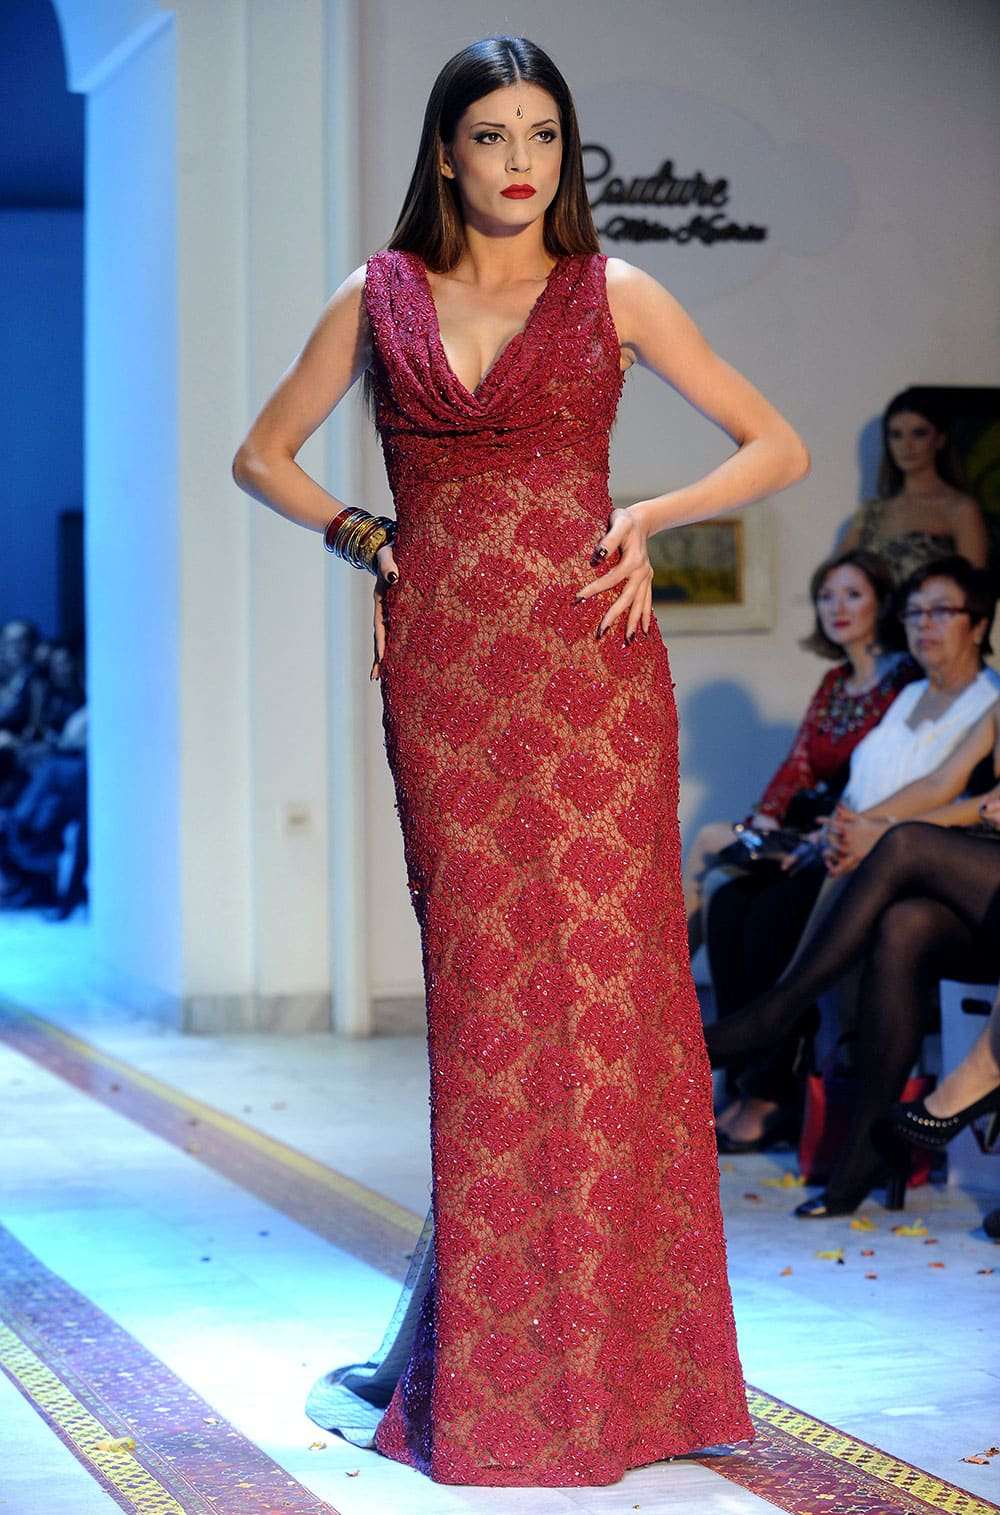 A model displays a creation by Macedonian designer Mila Kadriu during a fashion show in Skopje, Macedonia.